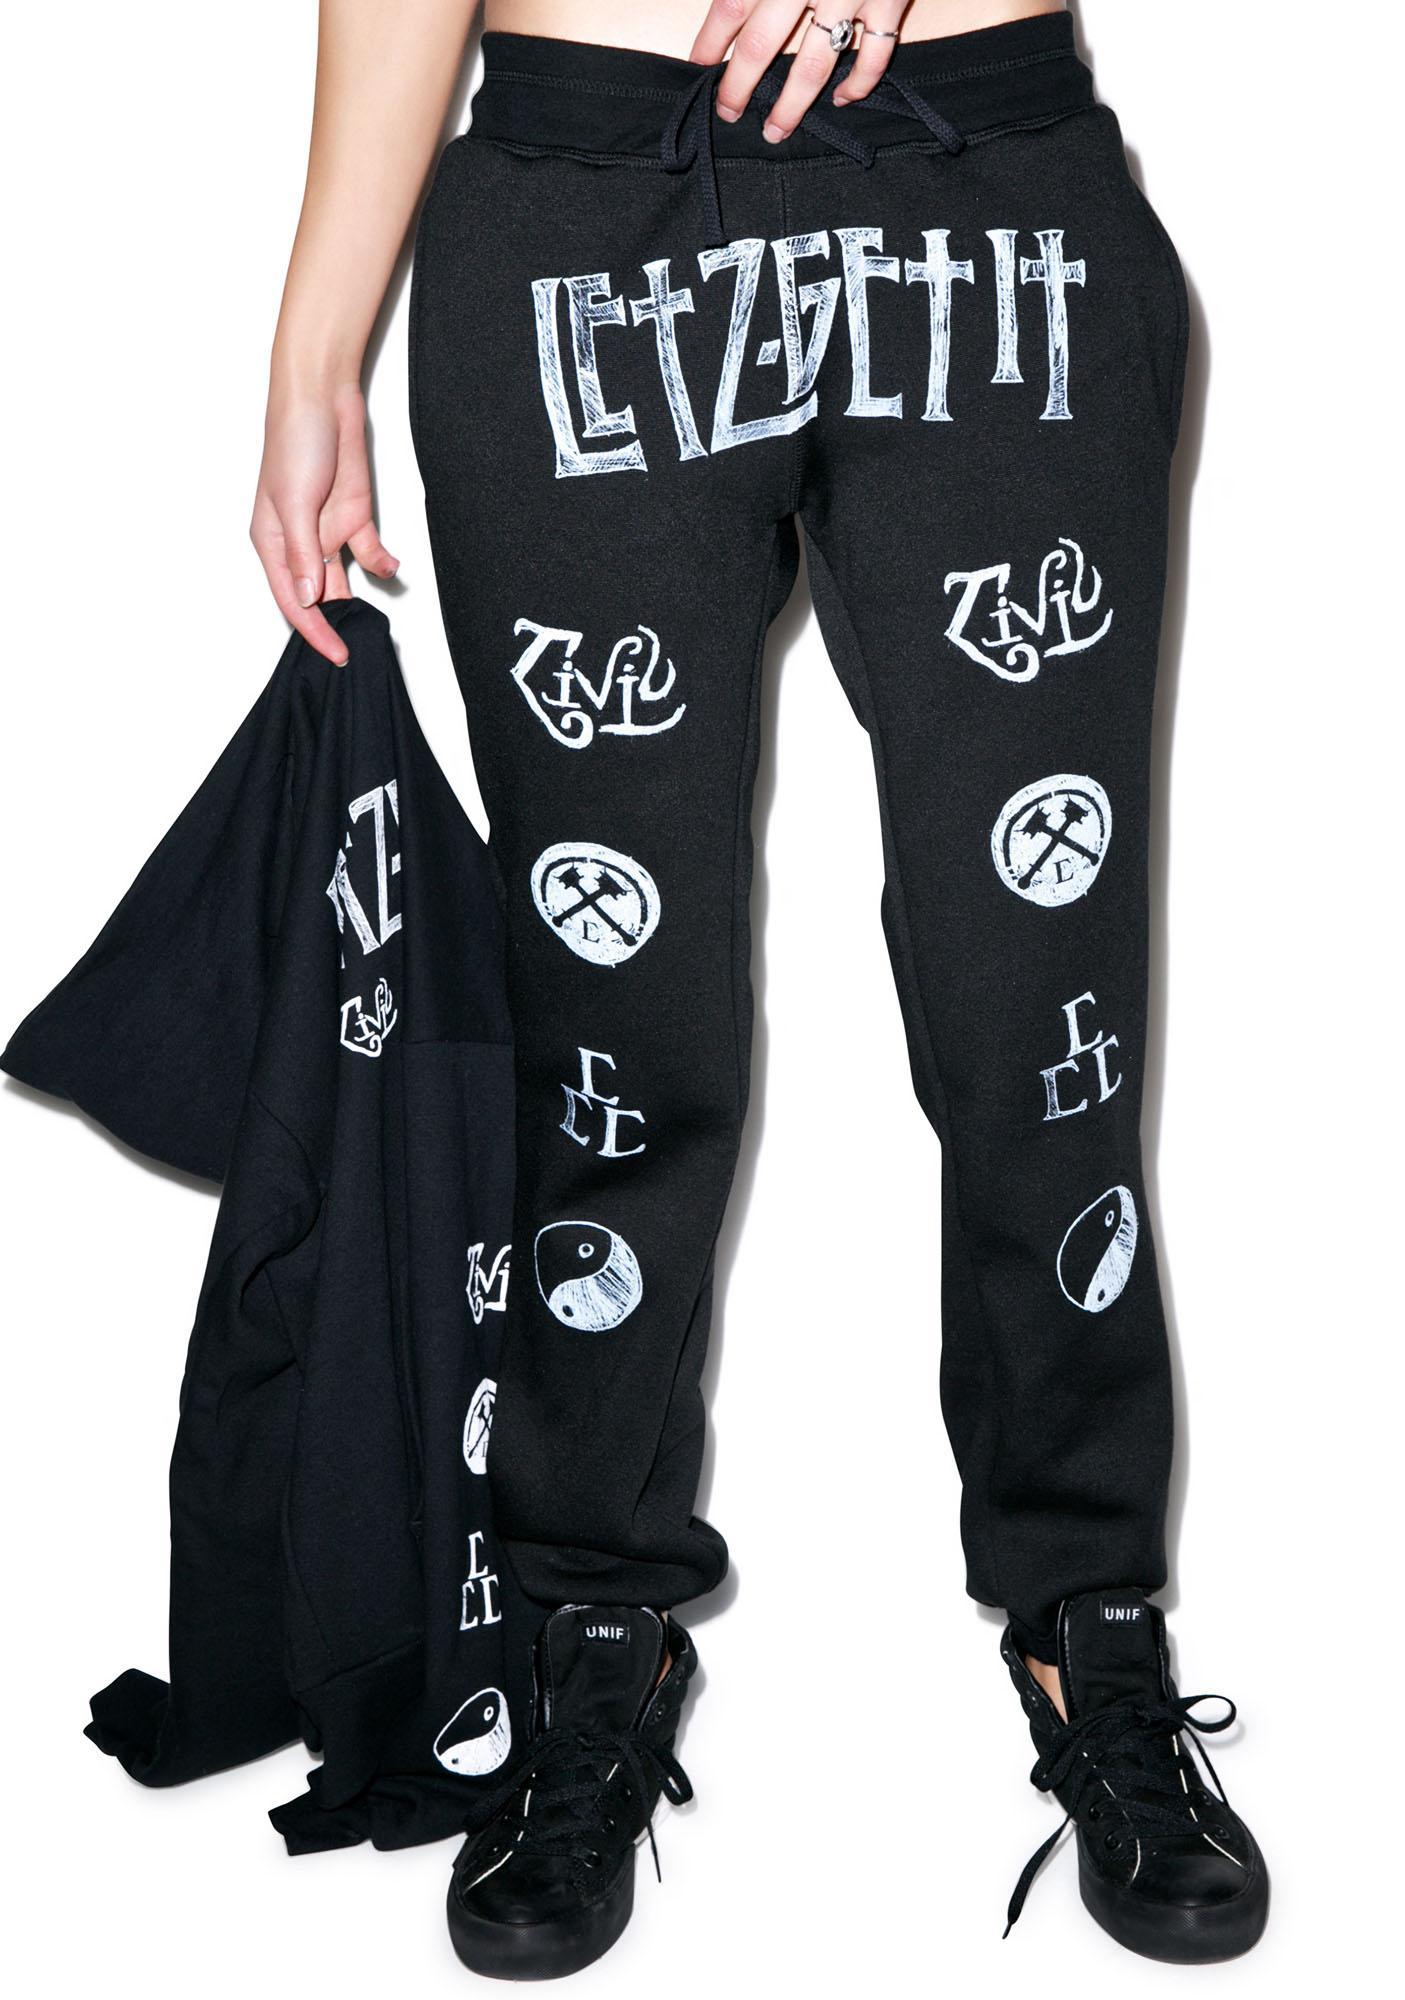 Civil Clothing Letz Get It Runners